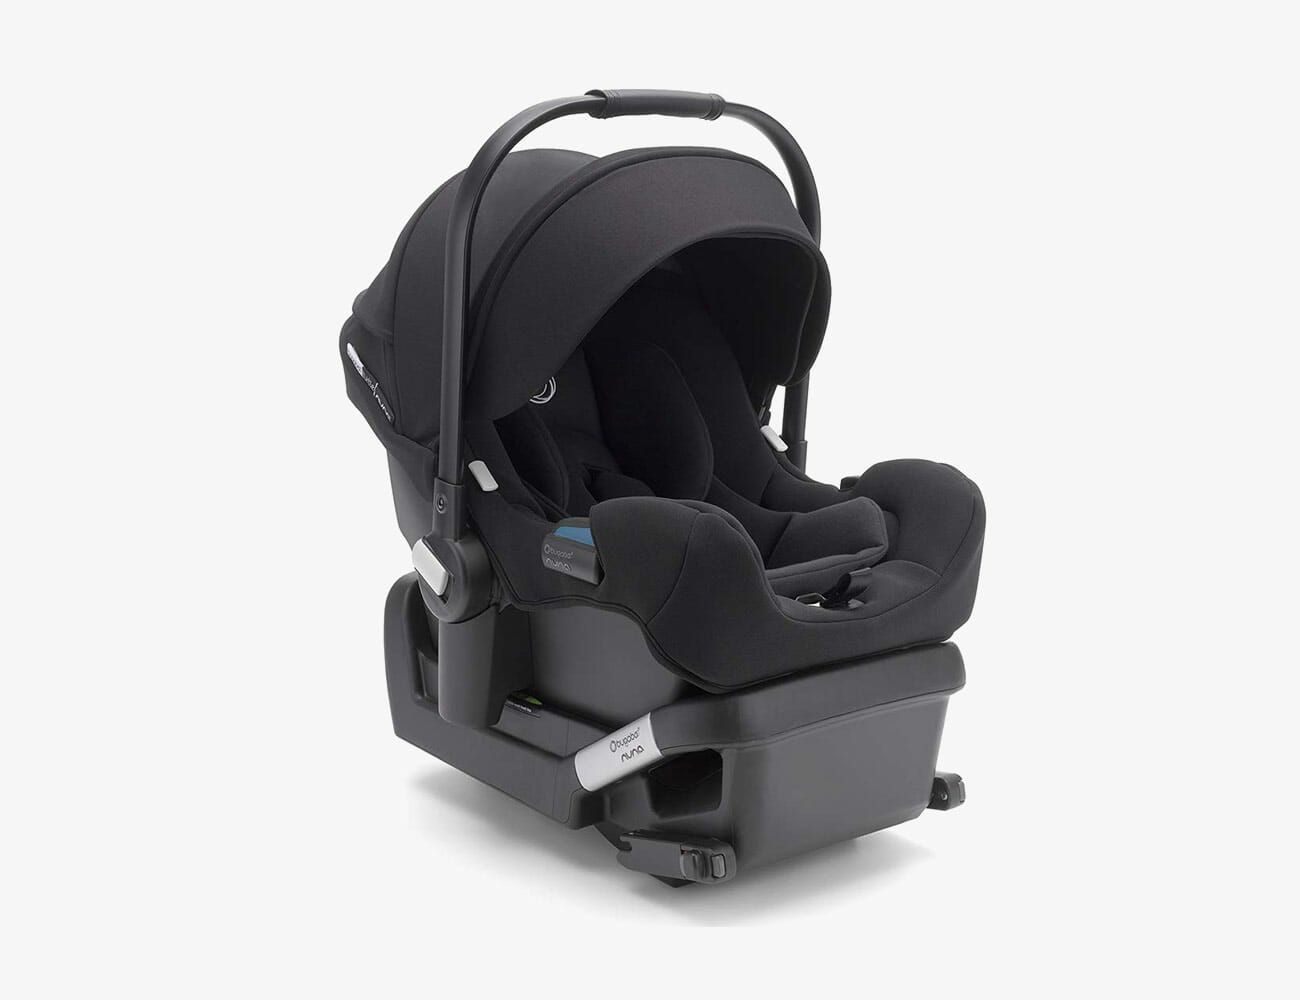 Astounding The Quick And Easy Guide To Choosing A Childrens Car Seat Creativecarmelina Interior Chair Design Creativecarmelinacom